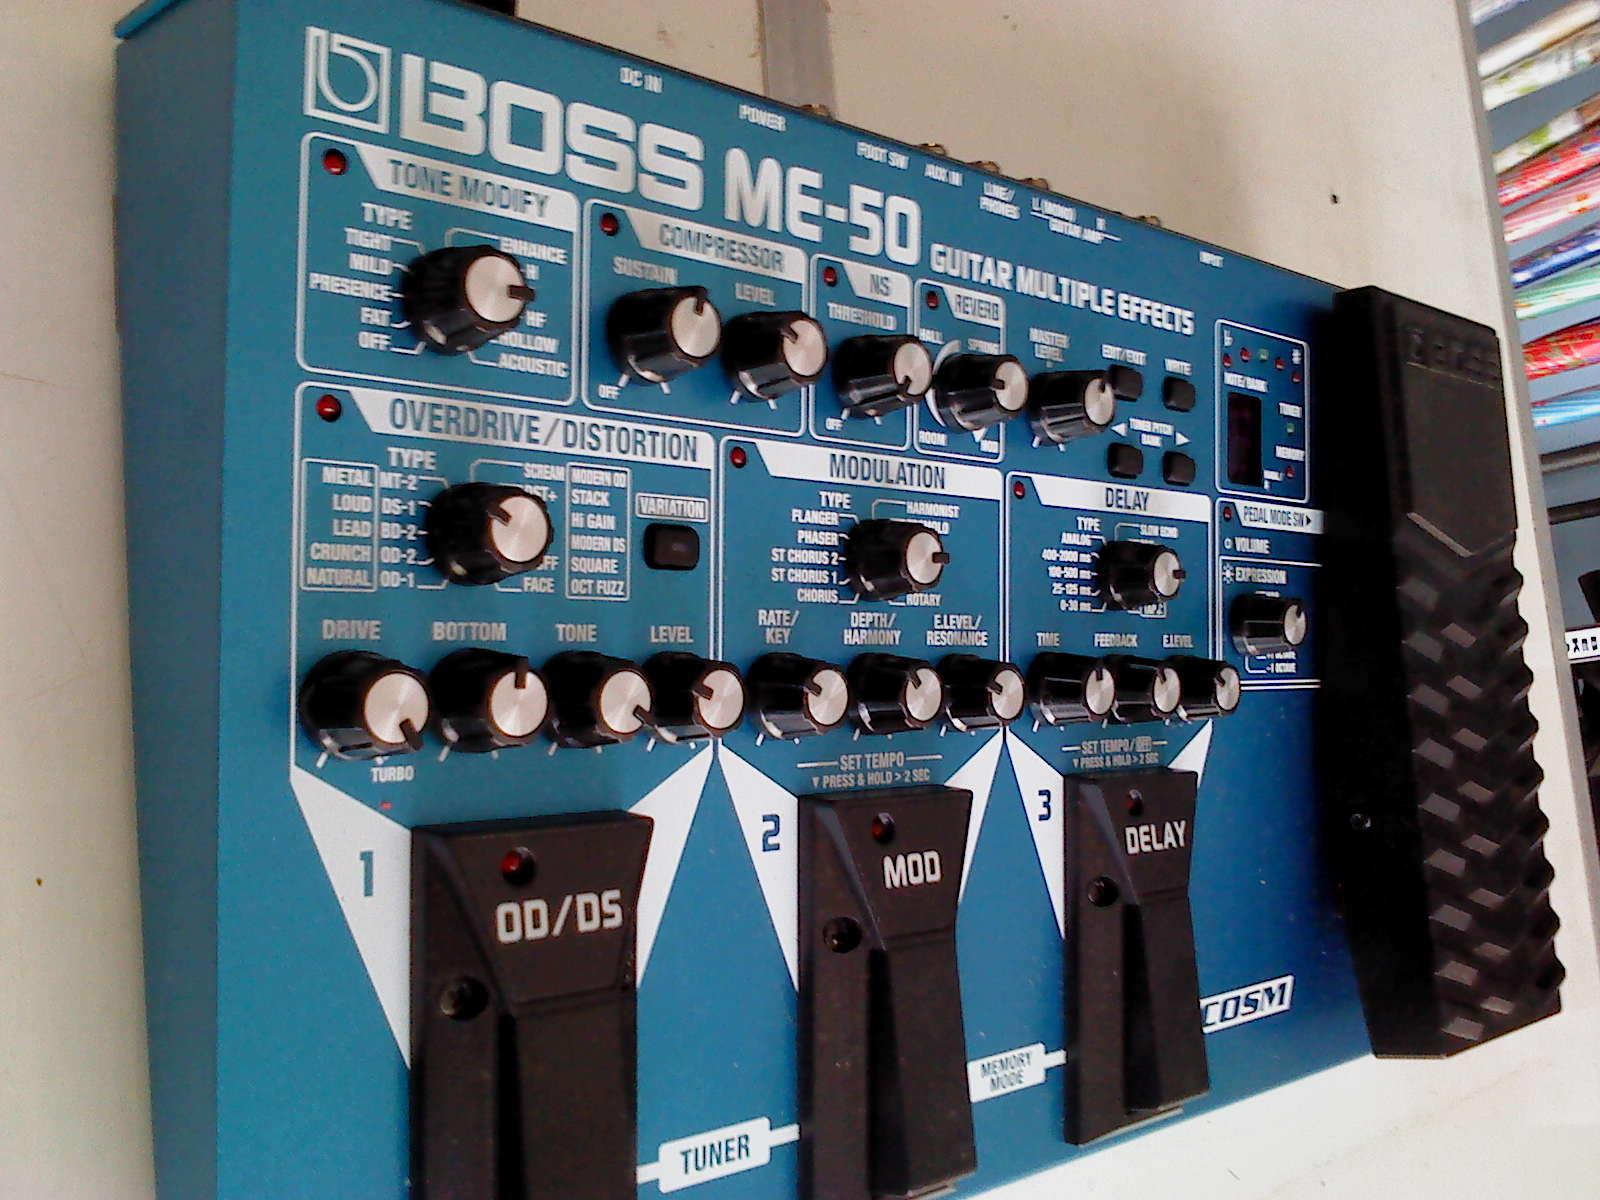 Baru guitar multiple effects BOSS ME 50 Adaptor Rp 2 juta